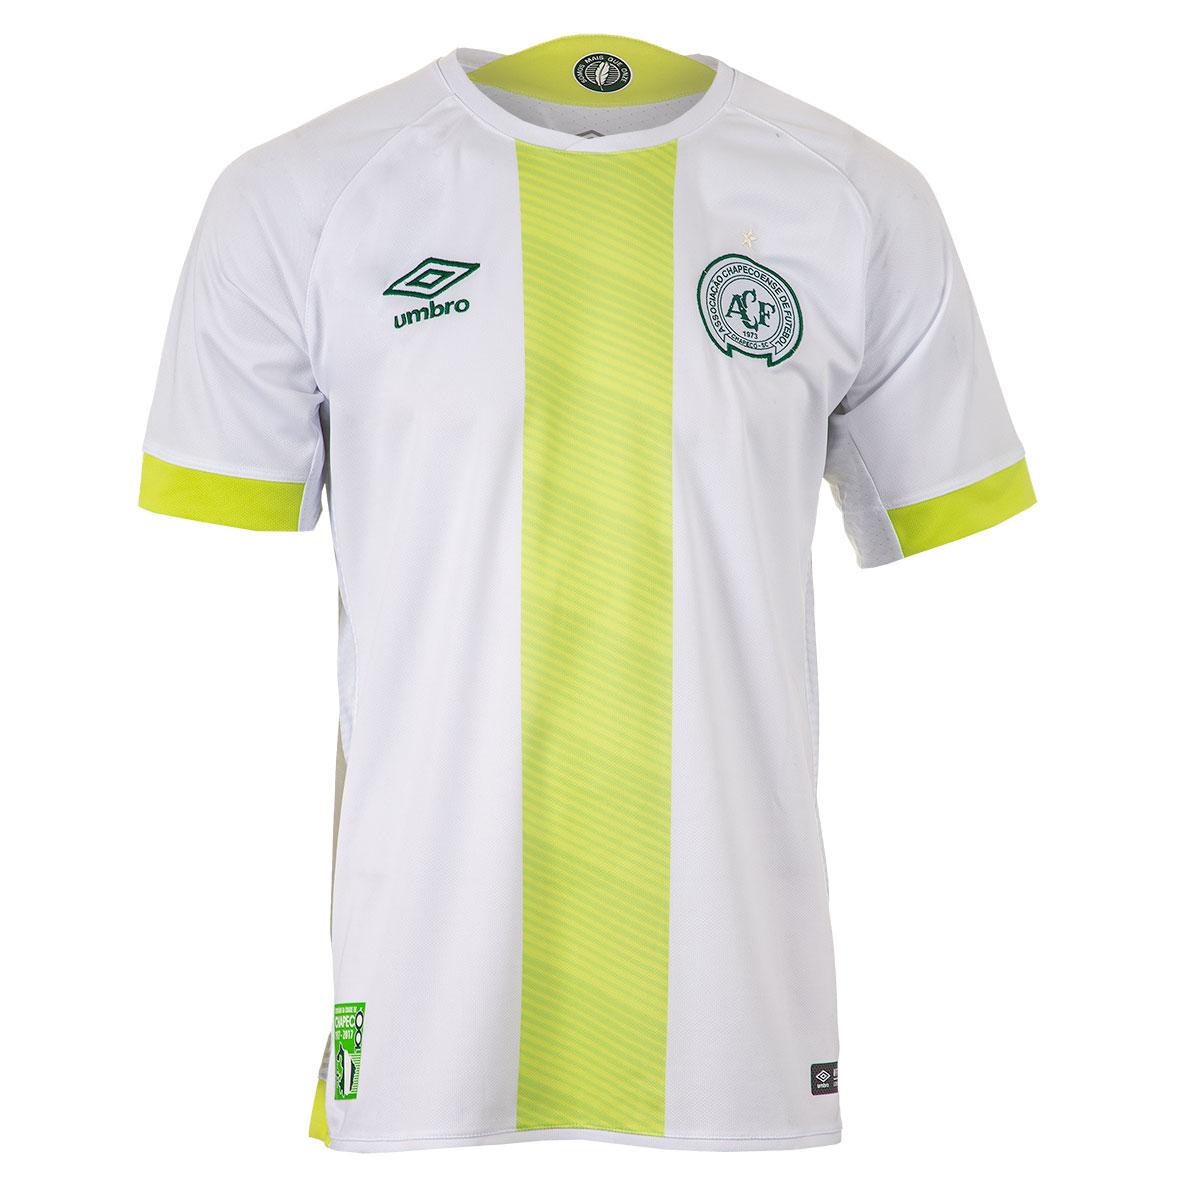 Camisa Masc. Umbro Chapecoense Of. 2 2017 Futebol - Branco/Verde